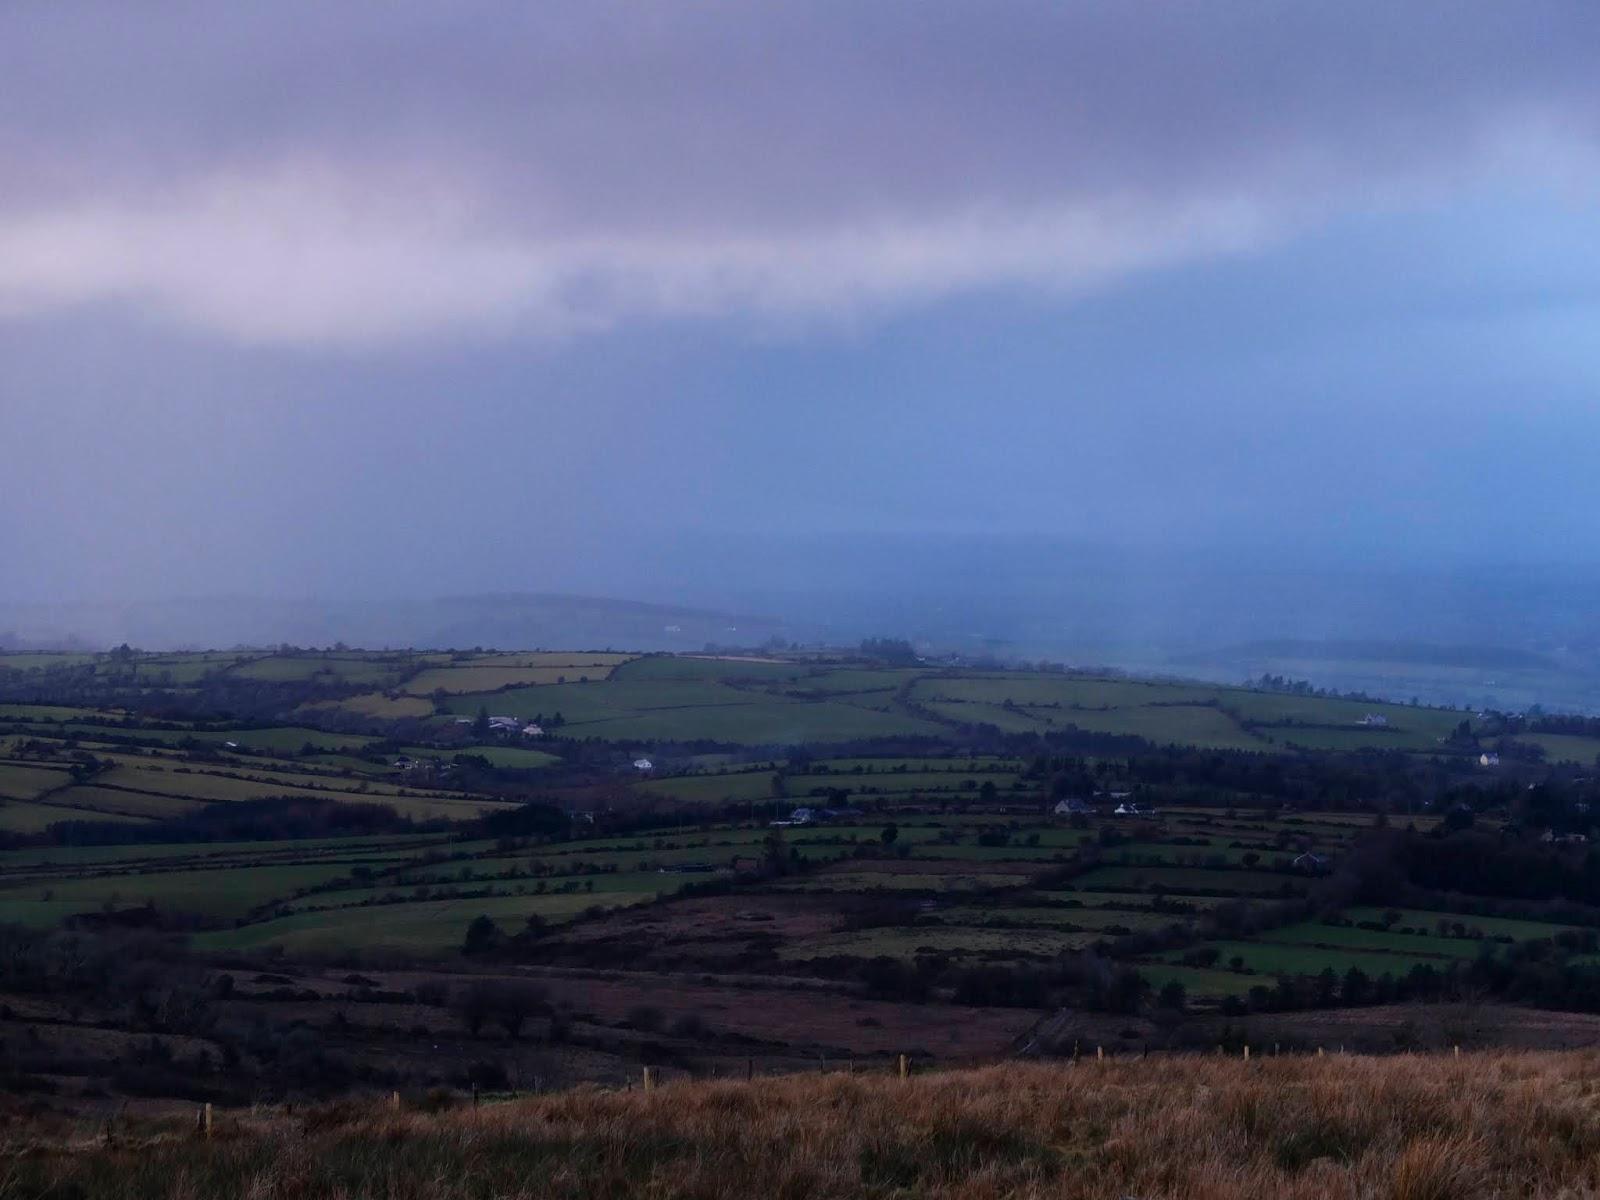 Rain clouds in a valley in North Cork bringing rain.